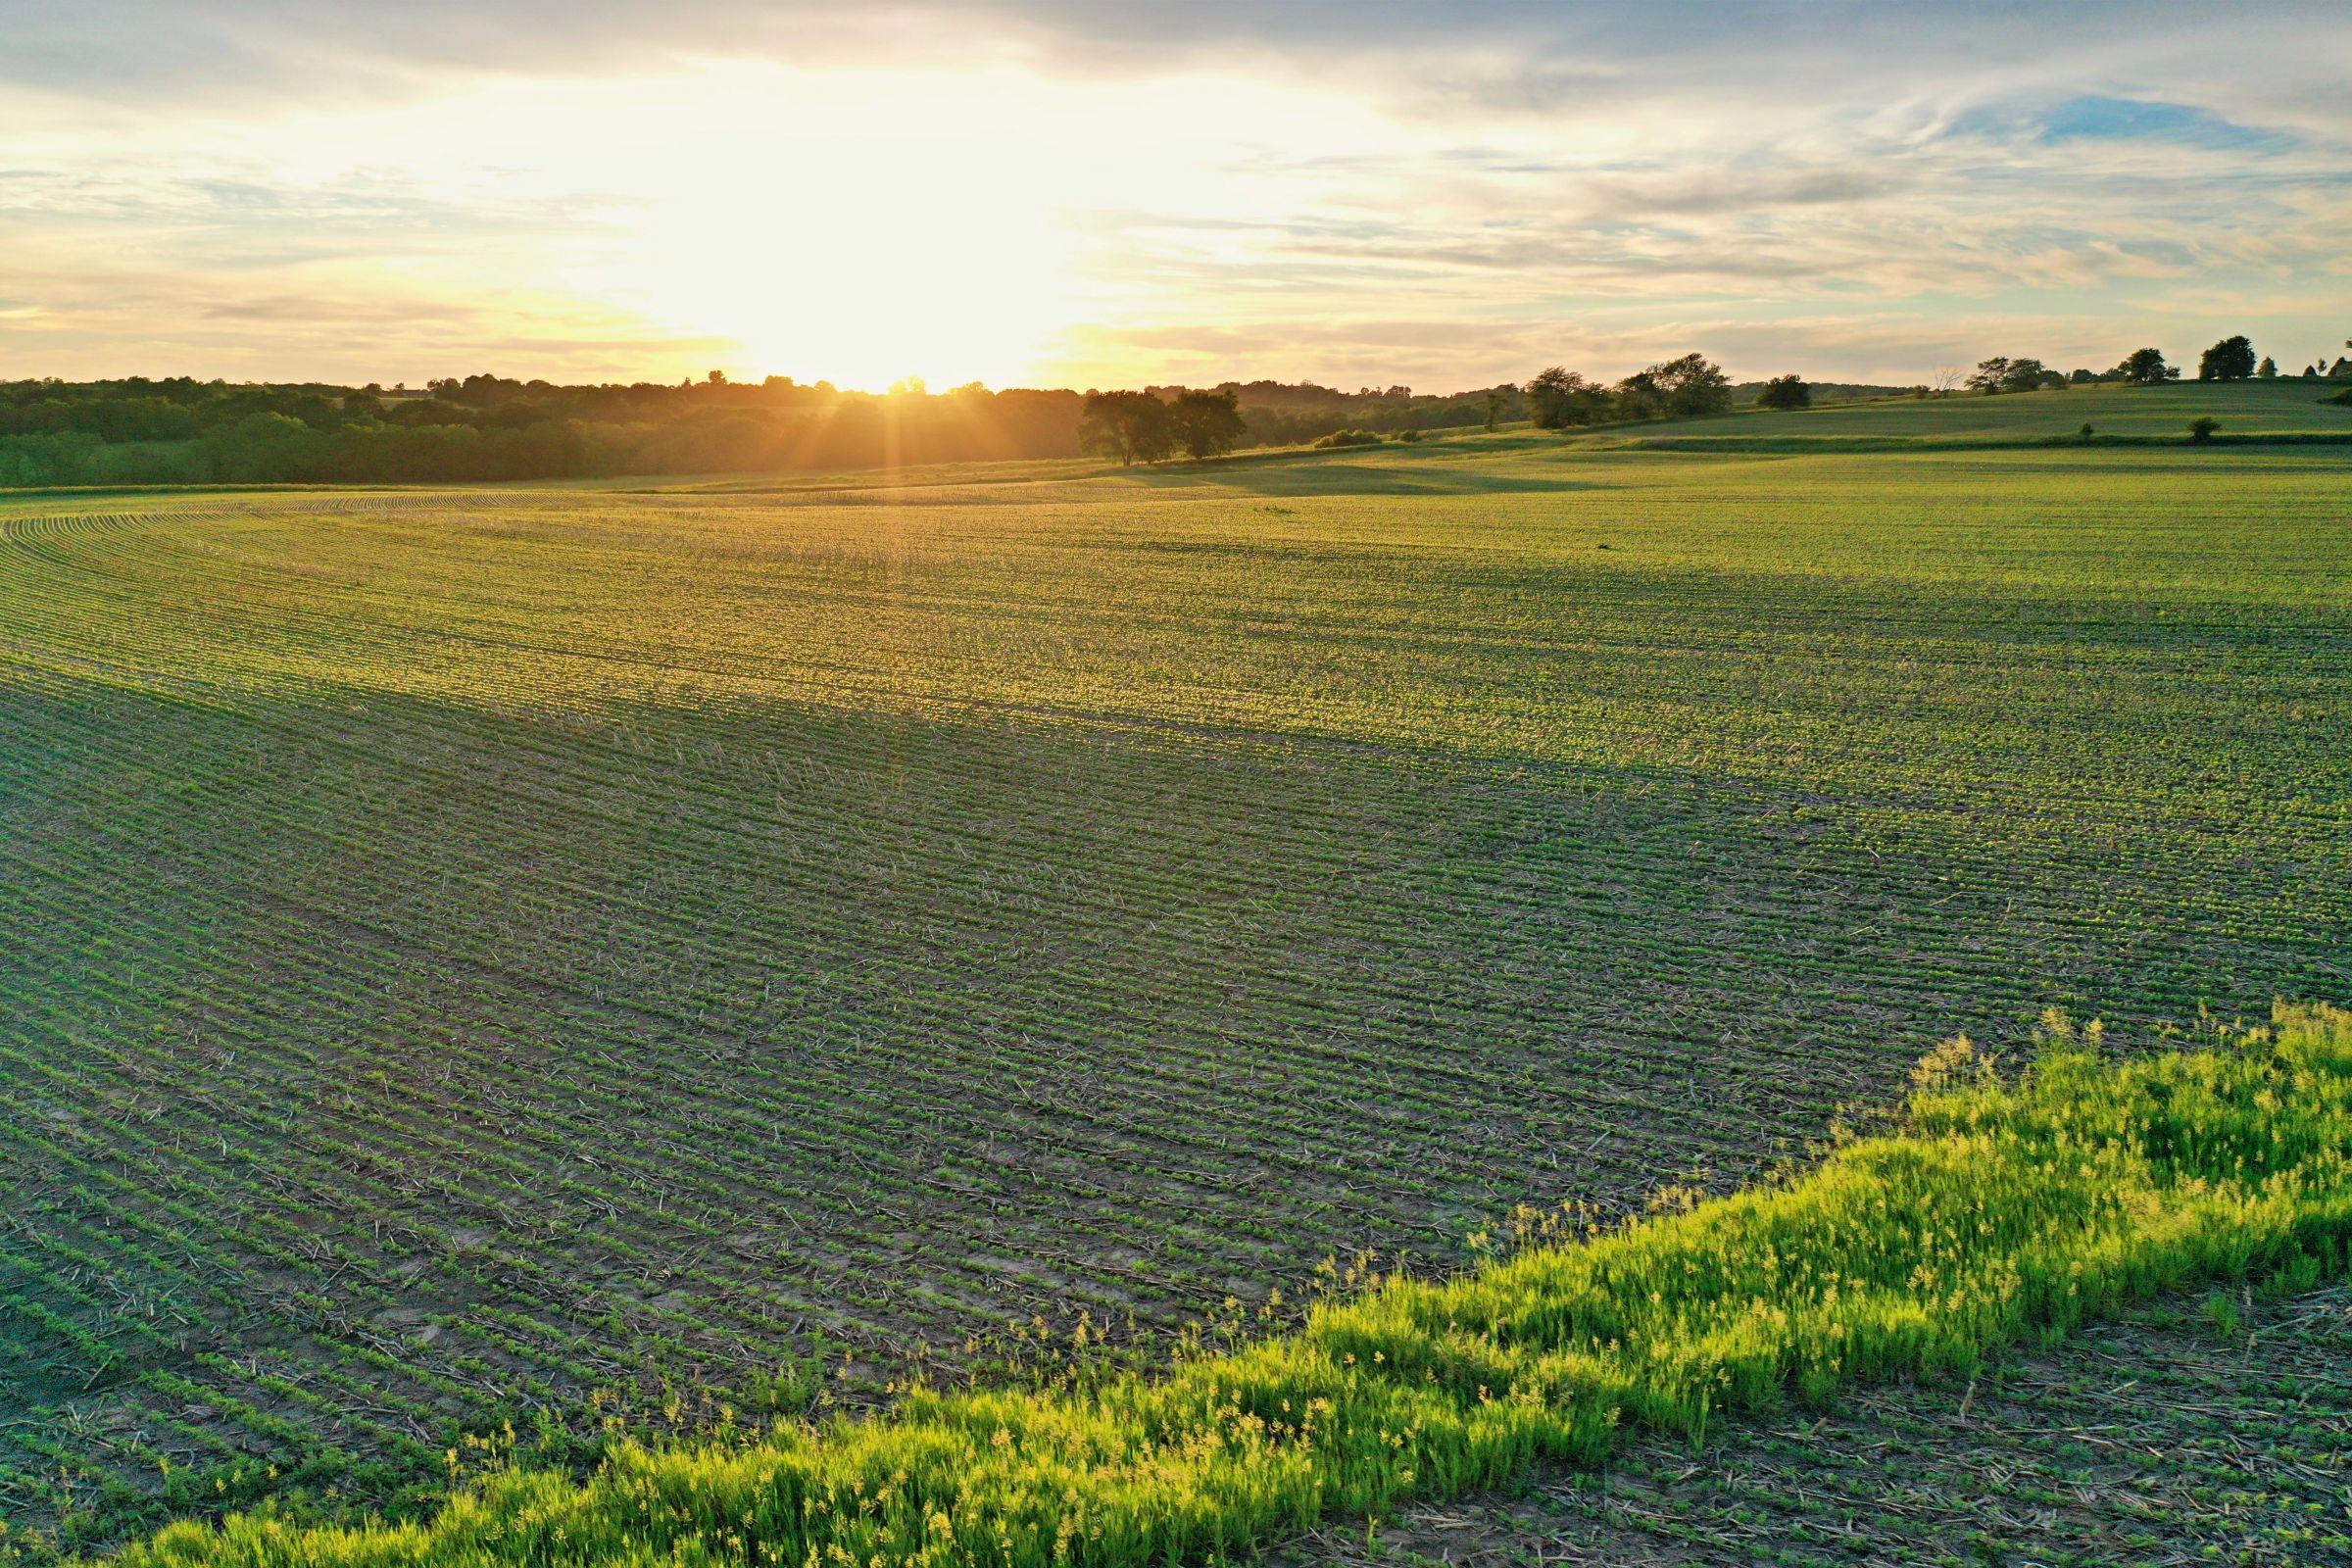 development-land-warren-county-iowa-20-acres-listing-number-15424-2-2021-03-25-201455.JPG